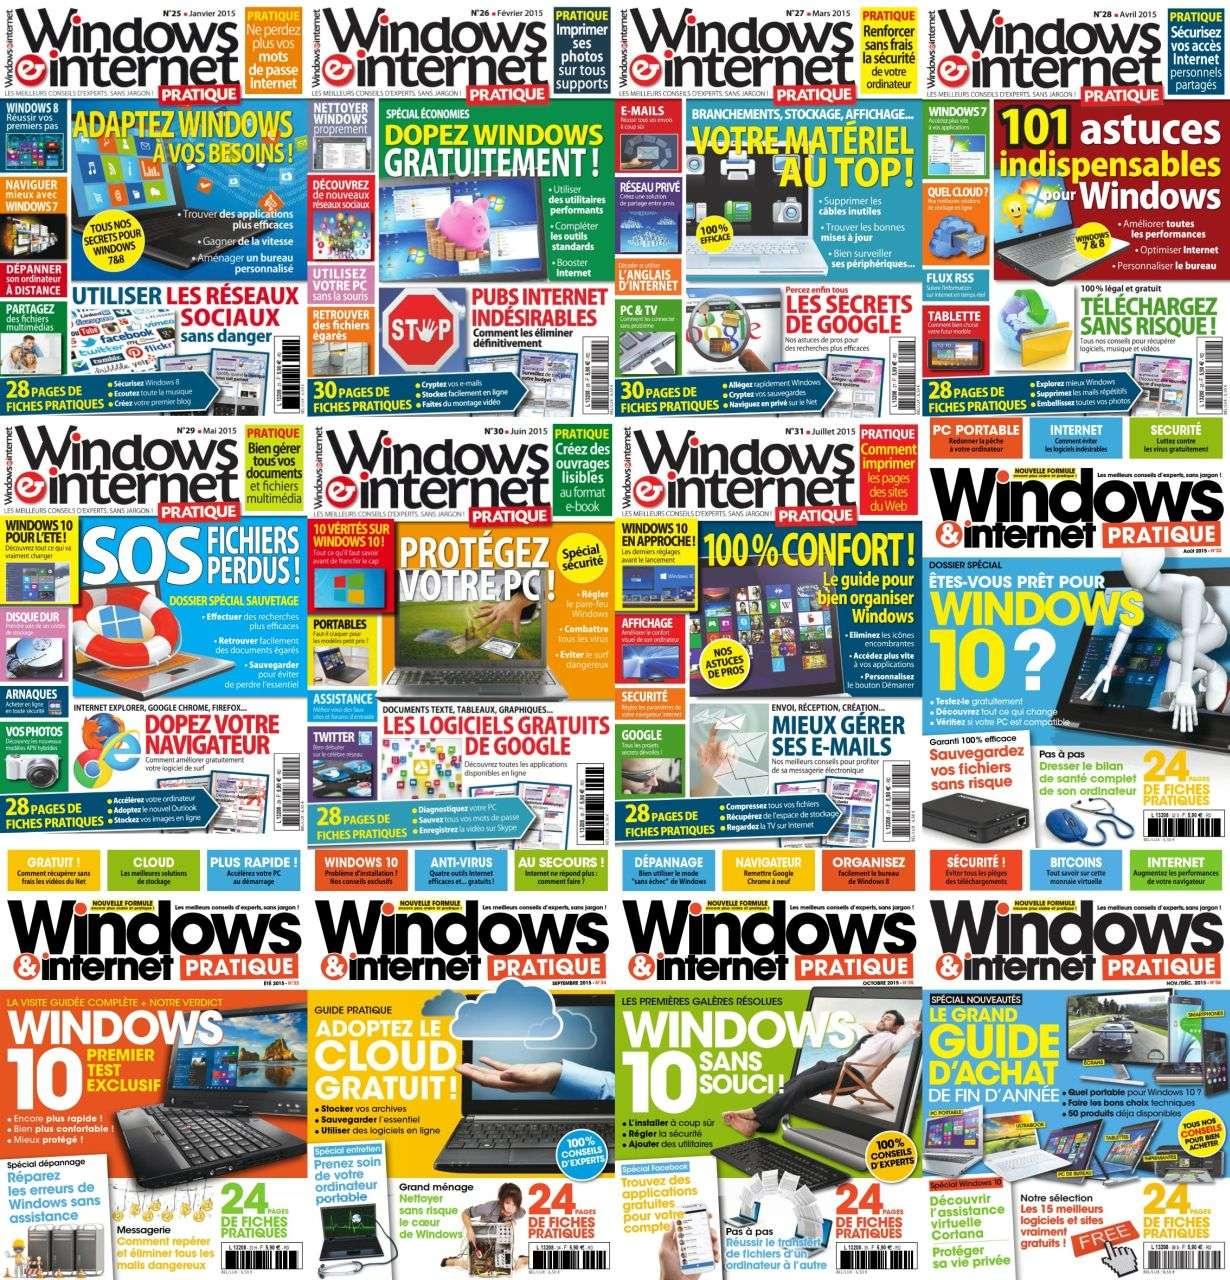 Windows & Internet Pratique - Collection Annuelle 2015